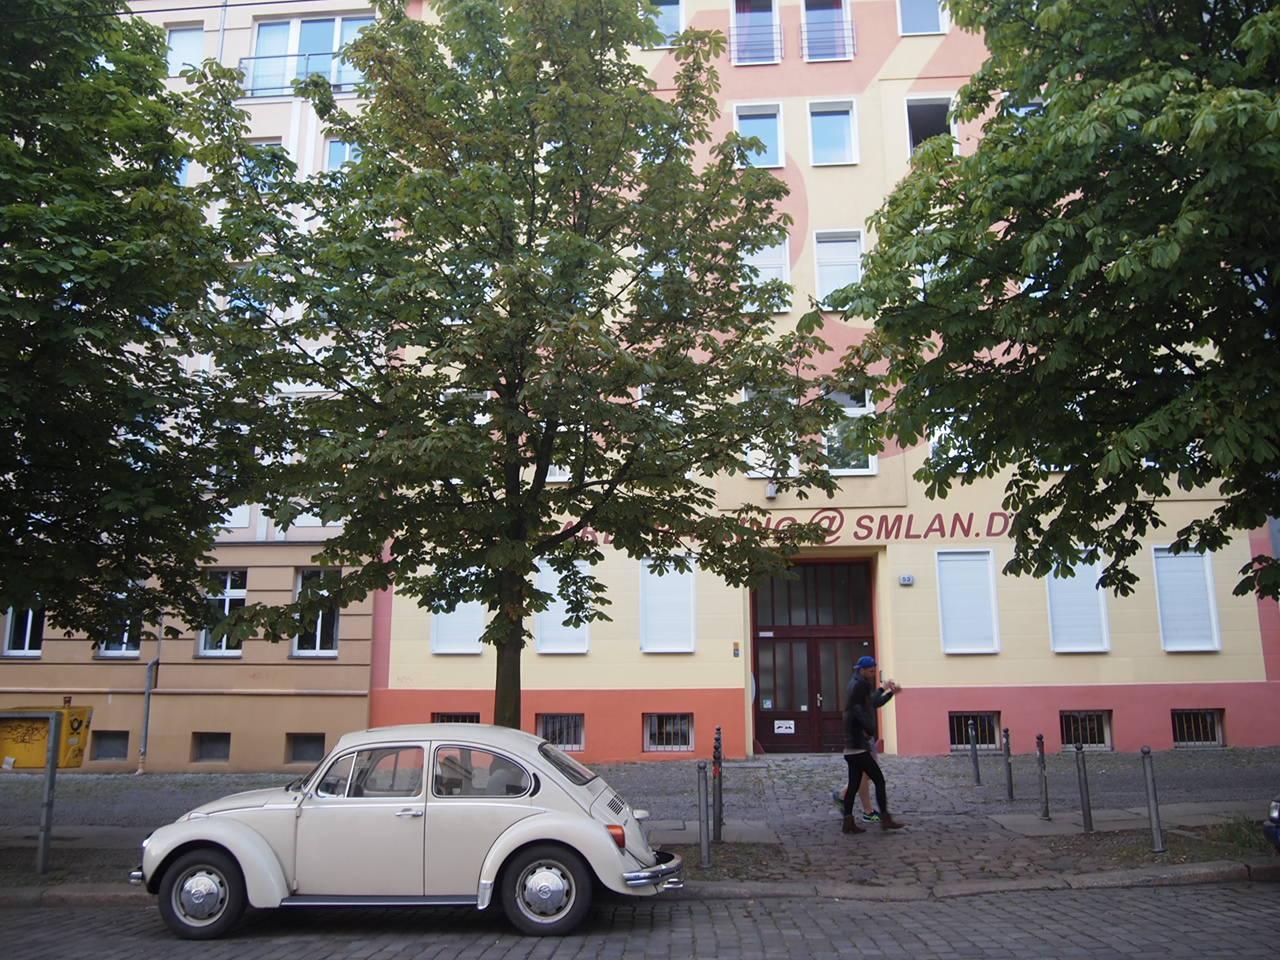 P6306269 アートと自然の多いベルリンの街並み